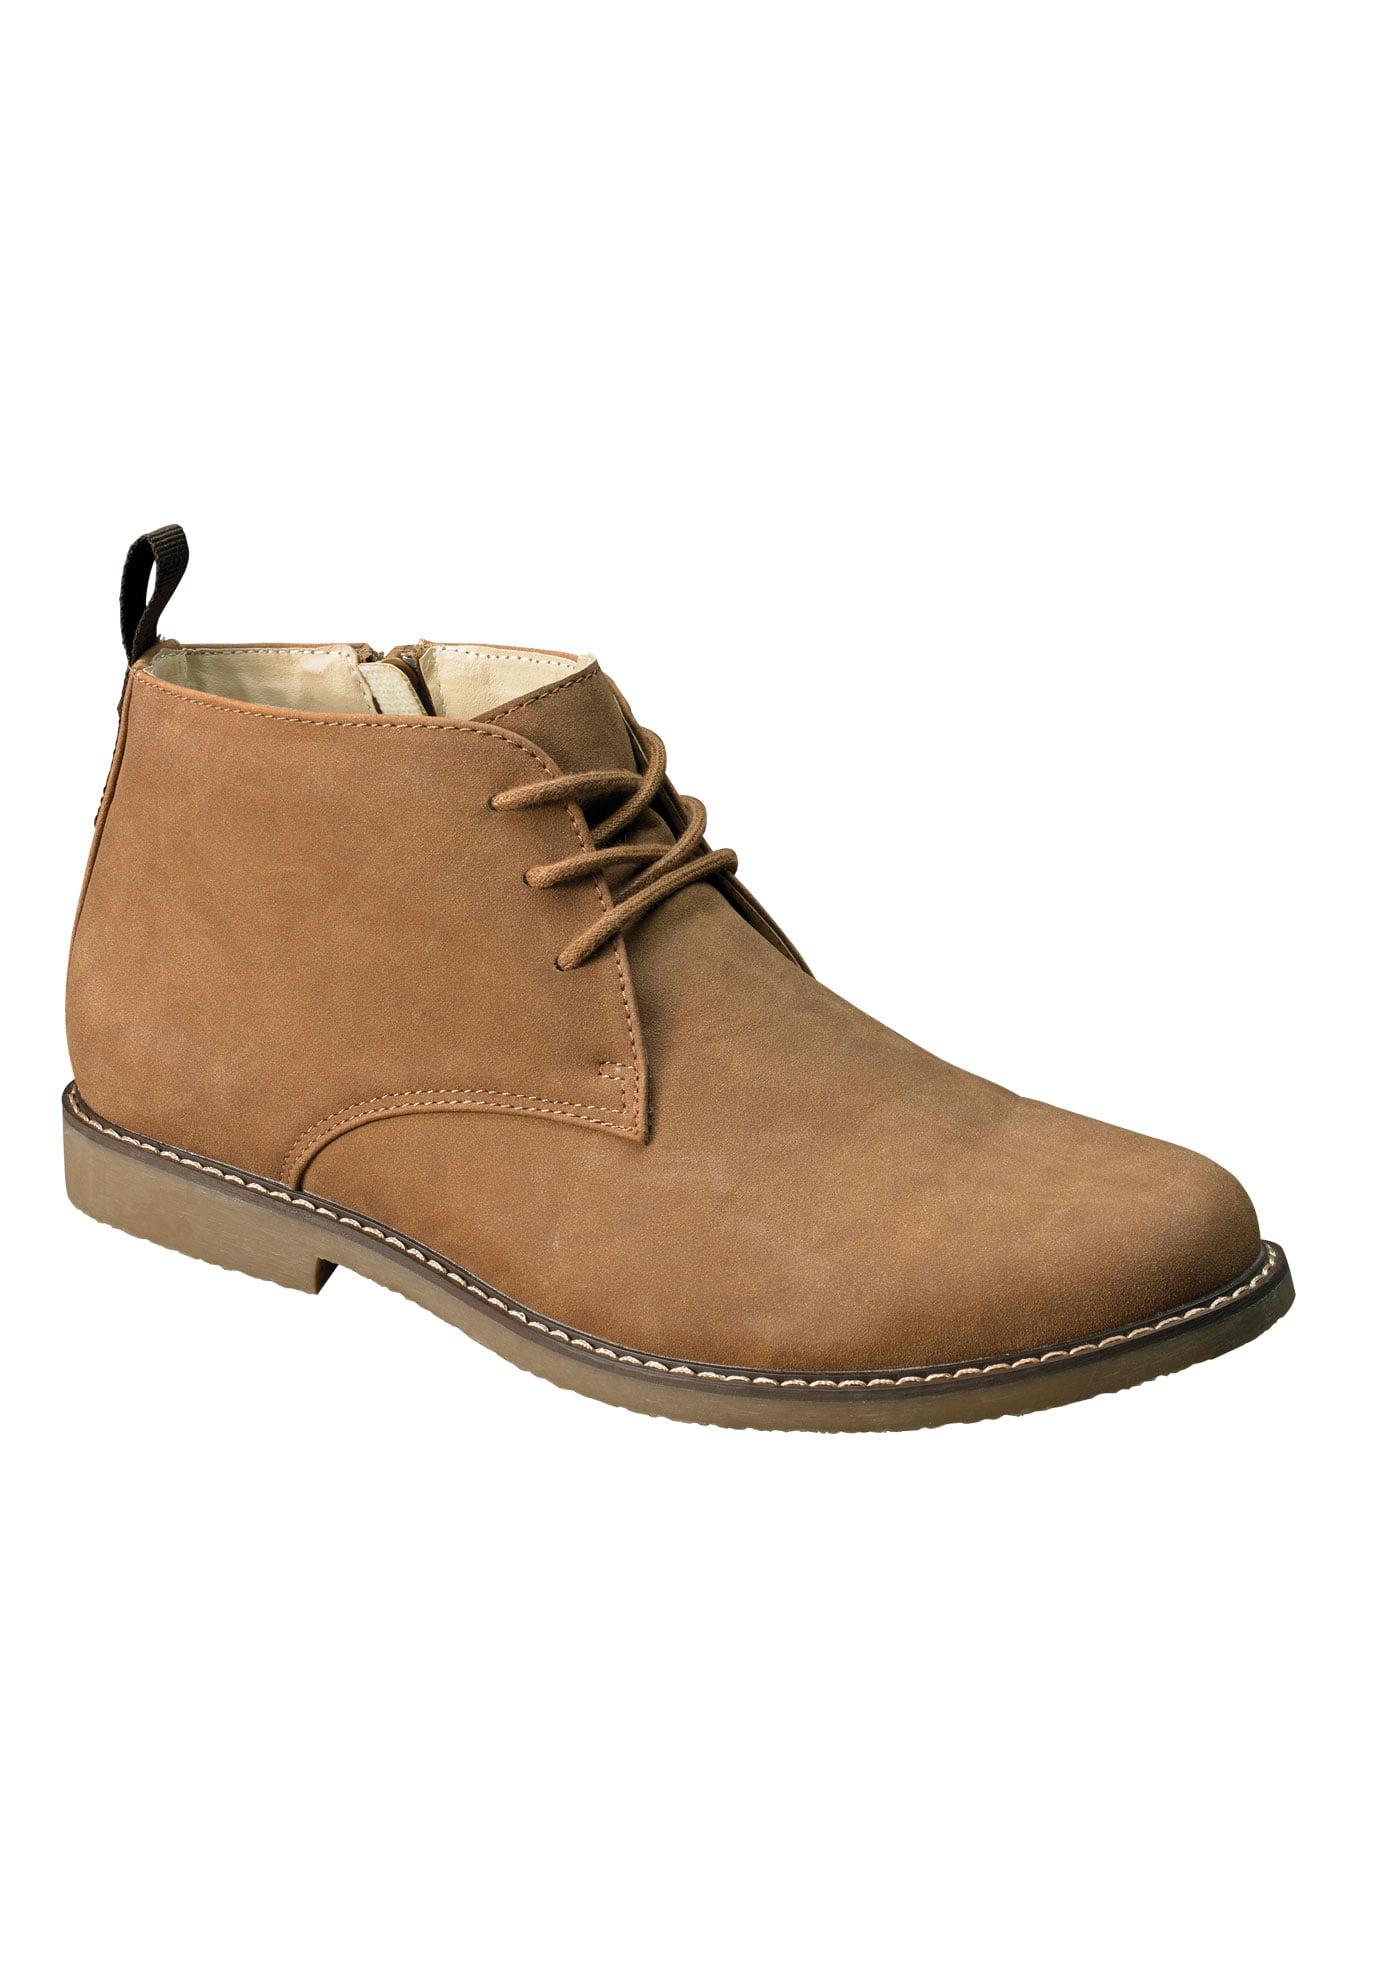 Wide Width ™ Chukka Boots - Walmart